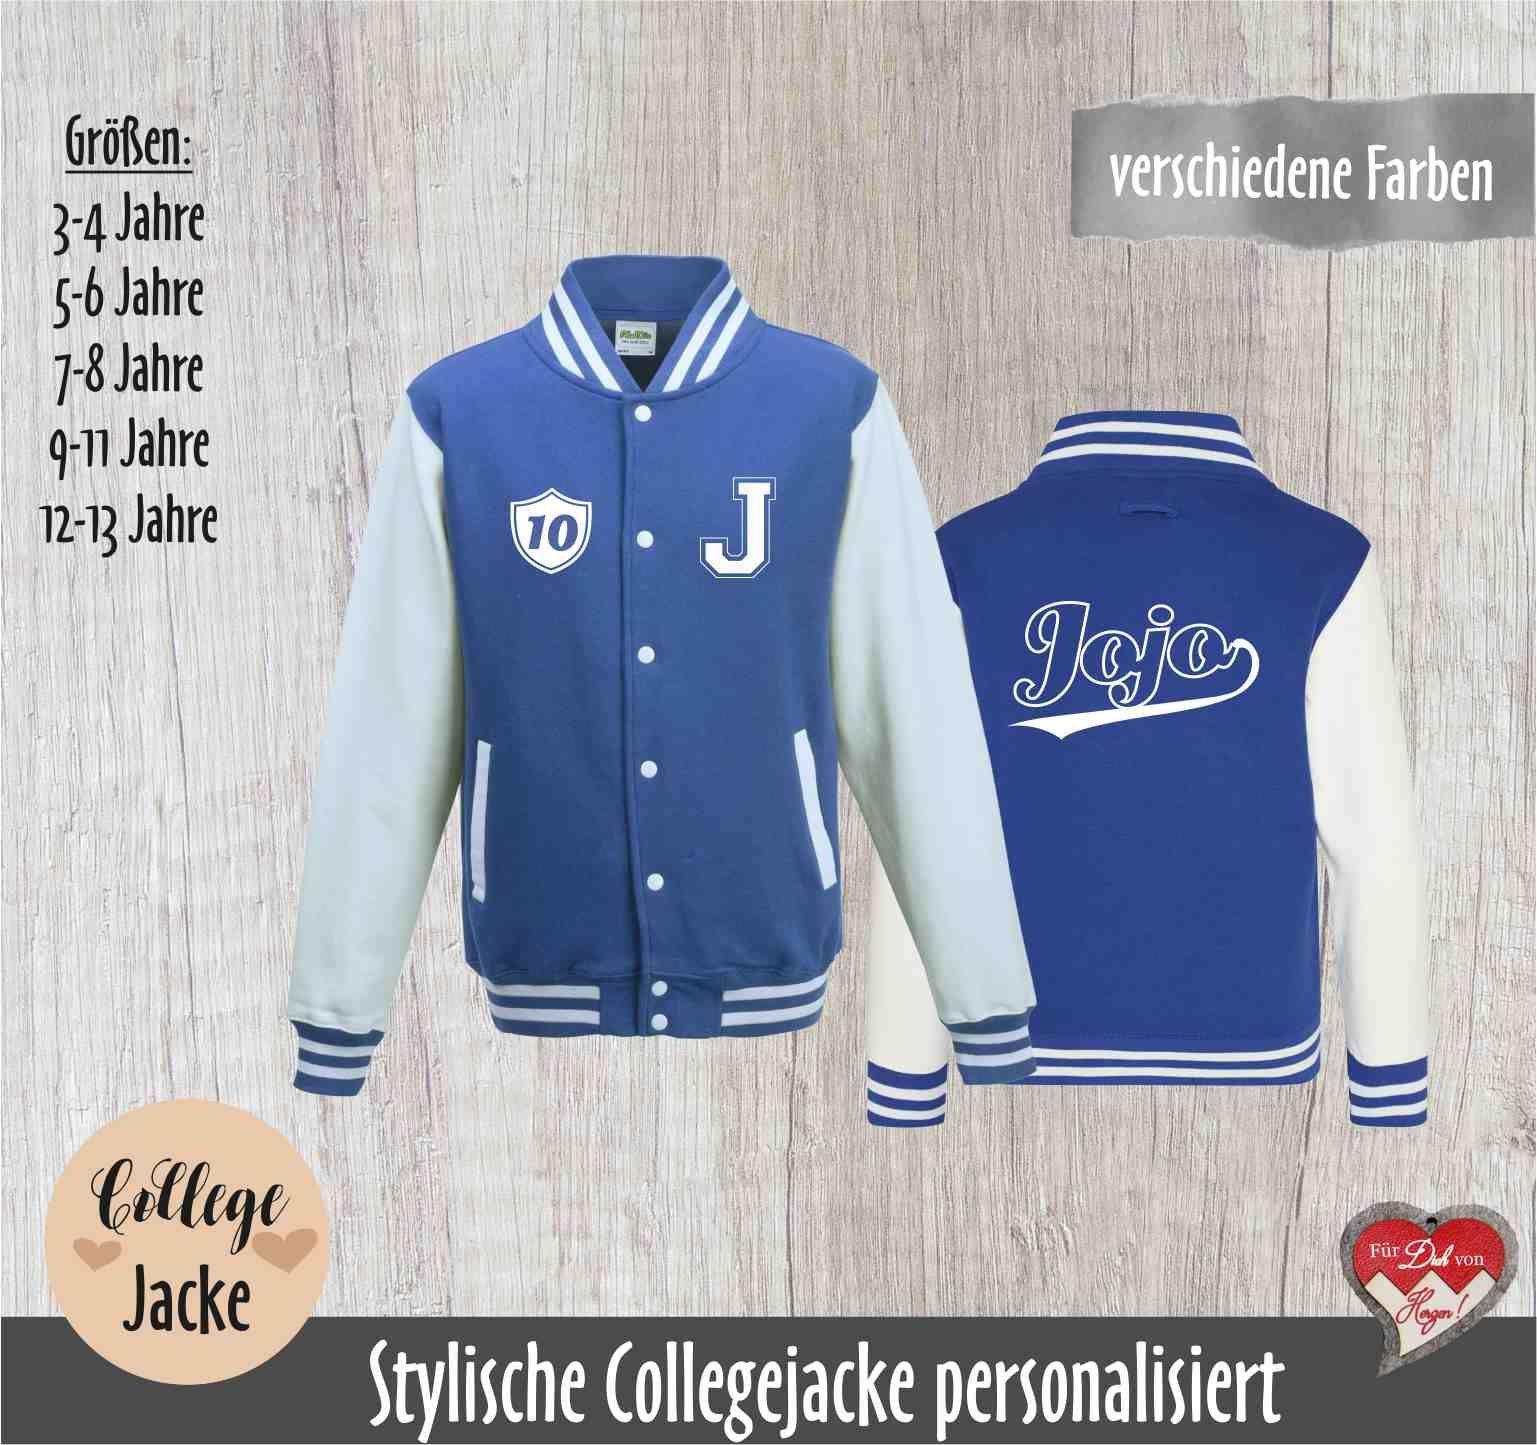 College jacket personalized, name, monogram, year